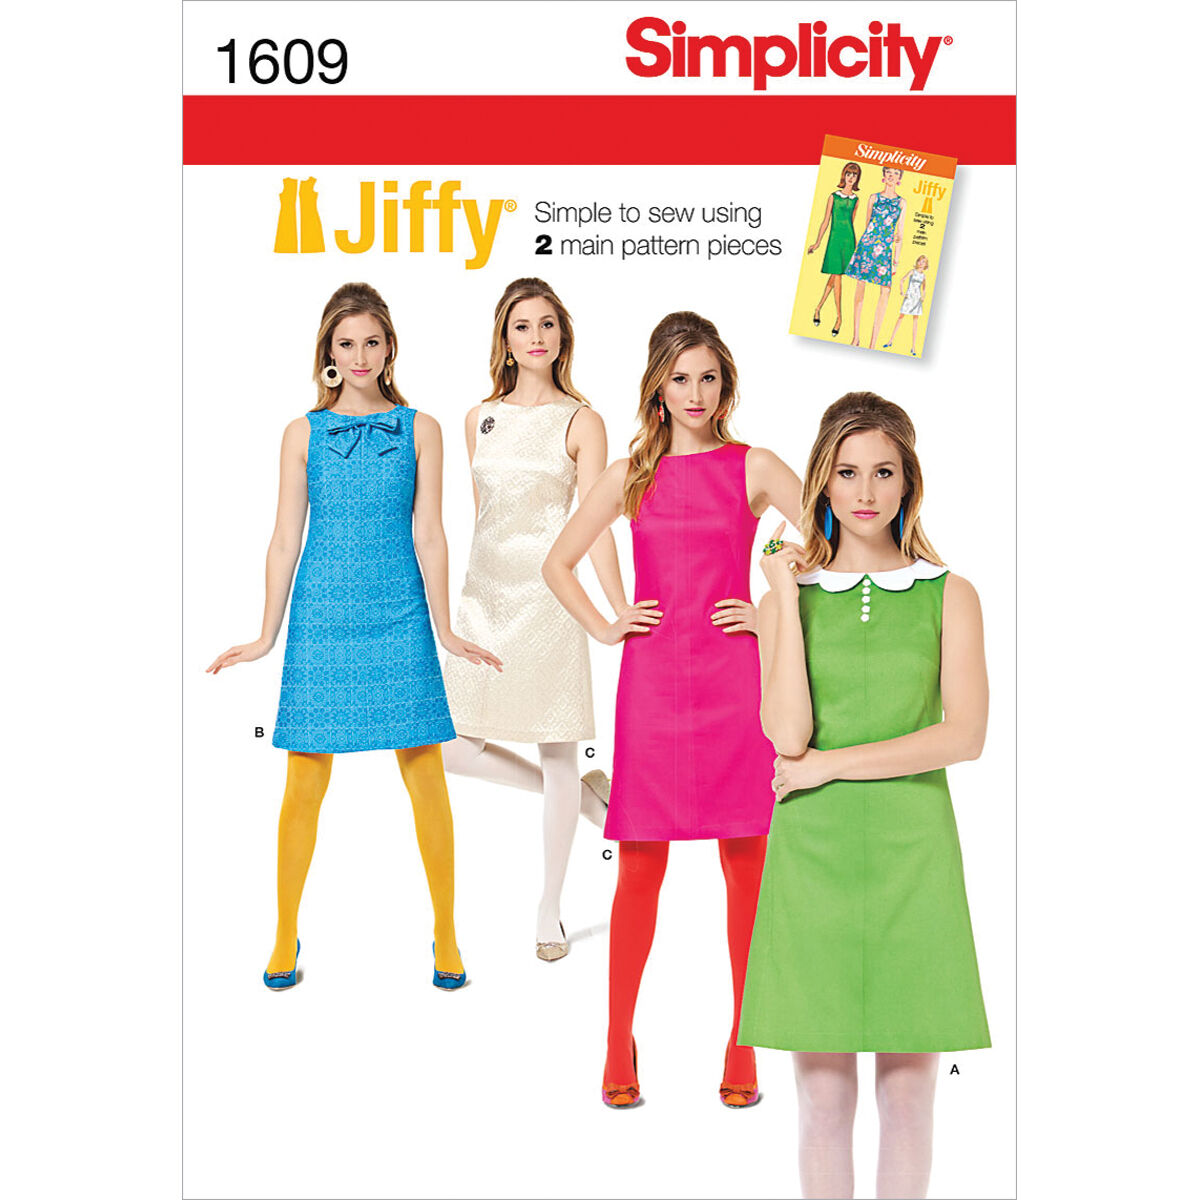 1960s – 70s Sewing Patterns- Dresses, Tops, Pants, Men's Simplicity Pattern 1609H5 6 - 8 - 10 - 12 - - Simplicity Misses Dr $17.95 AT vintagedancer.com